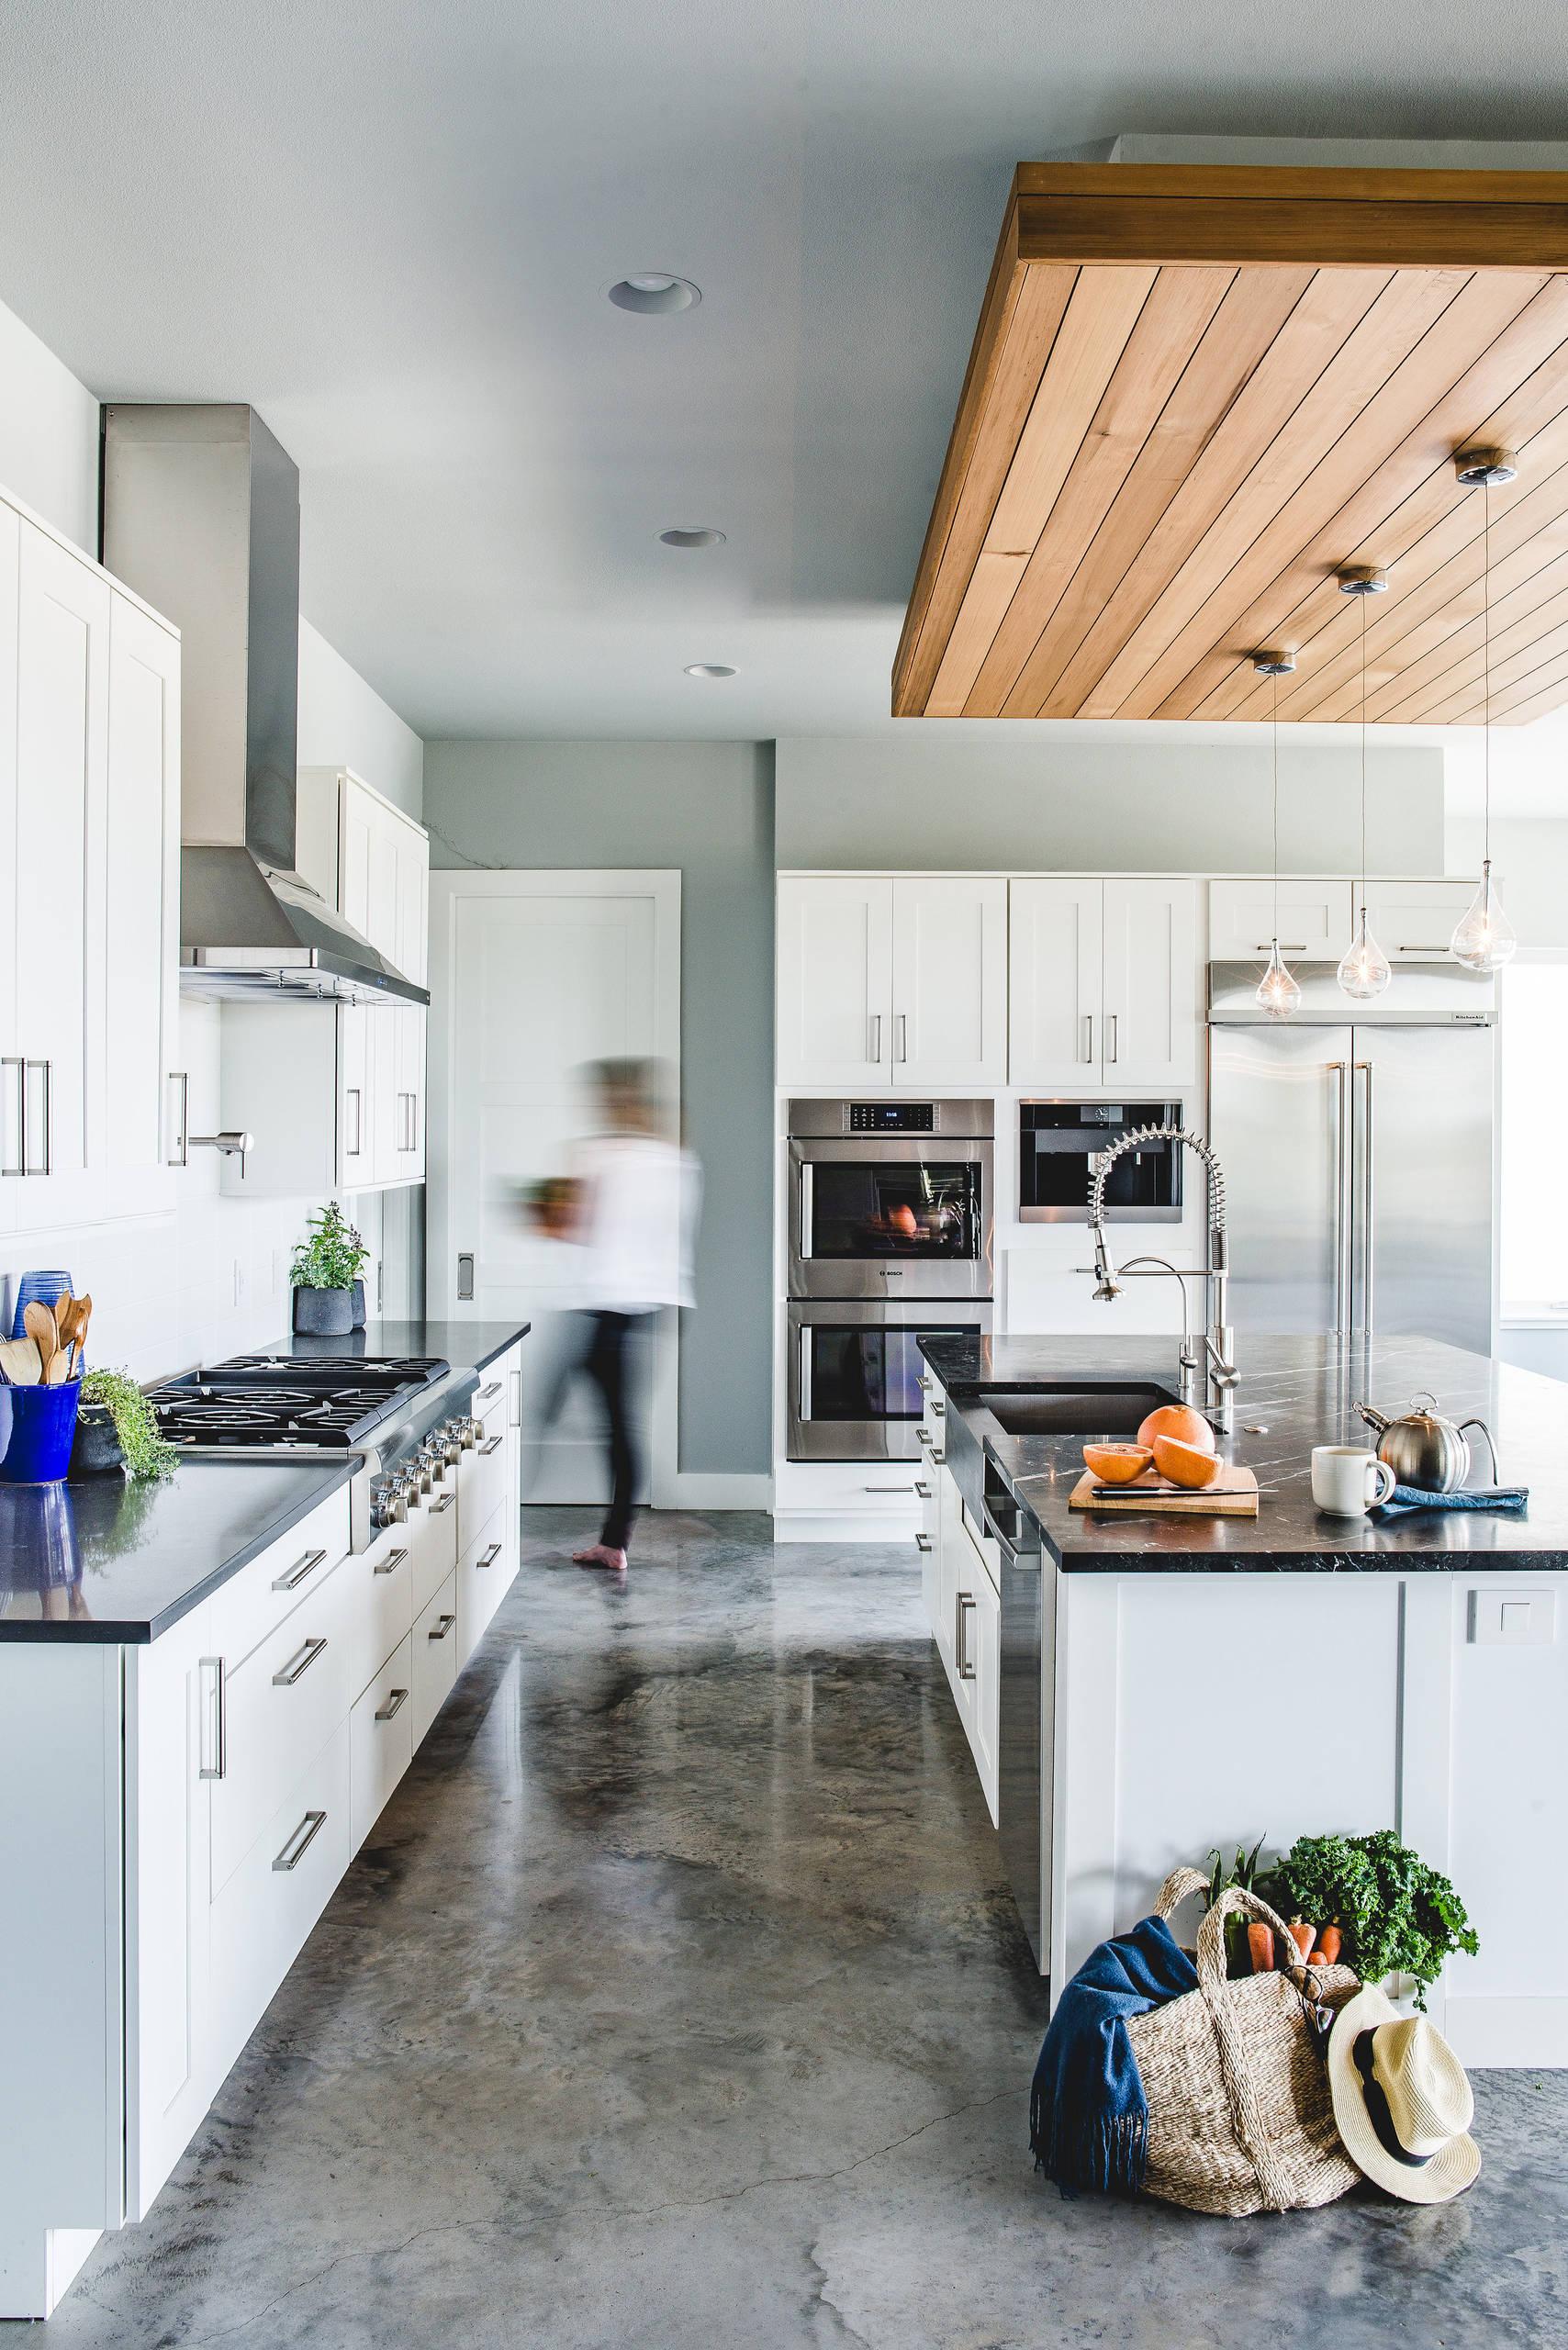 Polished concrete kitchen floor modern home interior design indianapolis cocnrete artisans solid concrete decorative shop room ideas